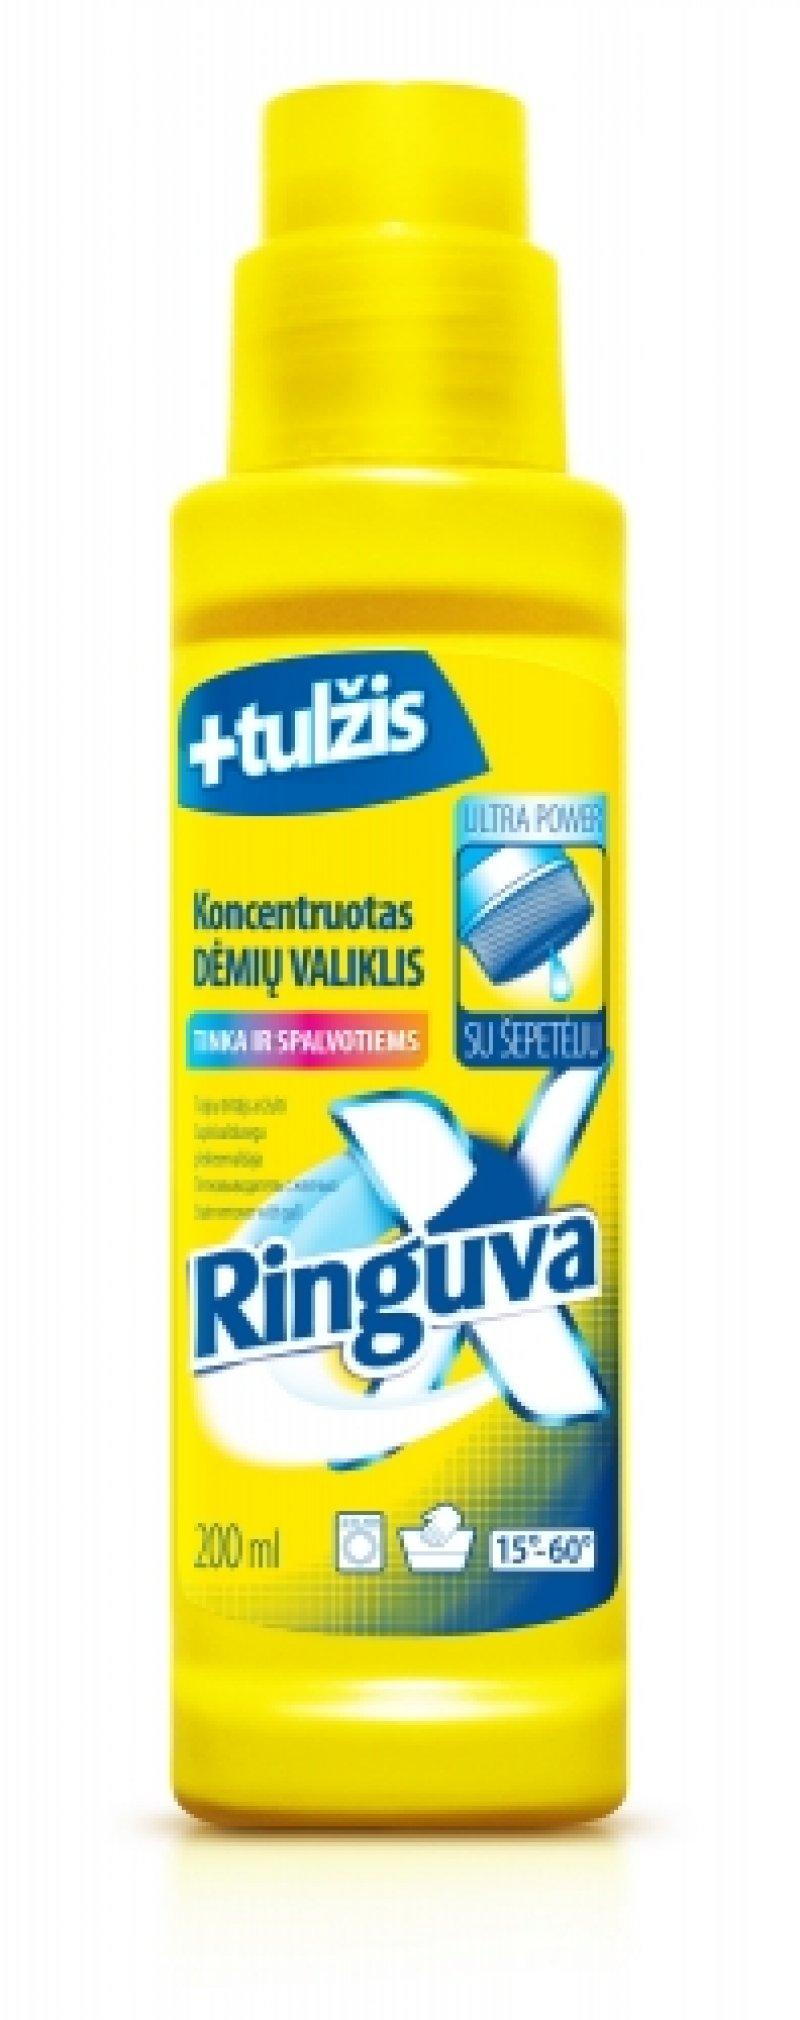 Ringuva_X______200_